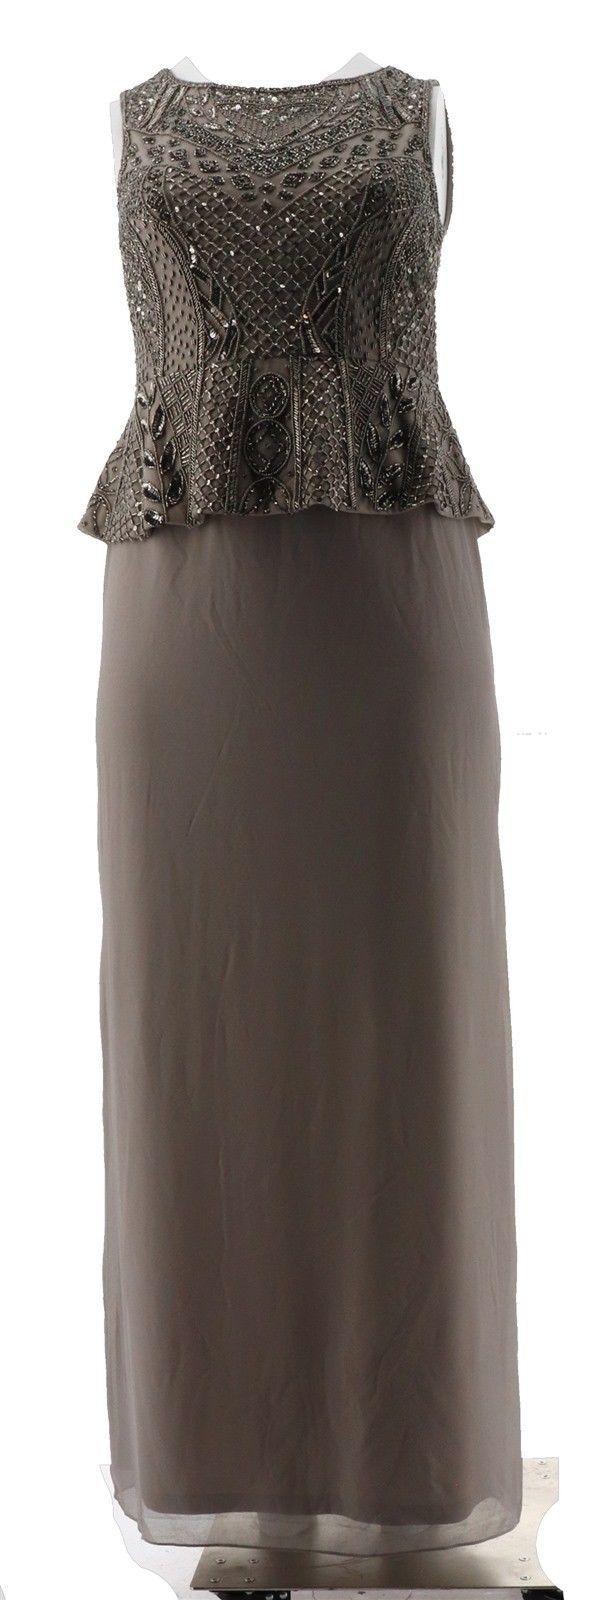 Adrianna Papell Sleeveless Beaded Peplum Long Dress Platinum 14 NEW